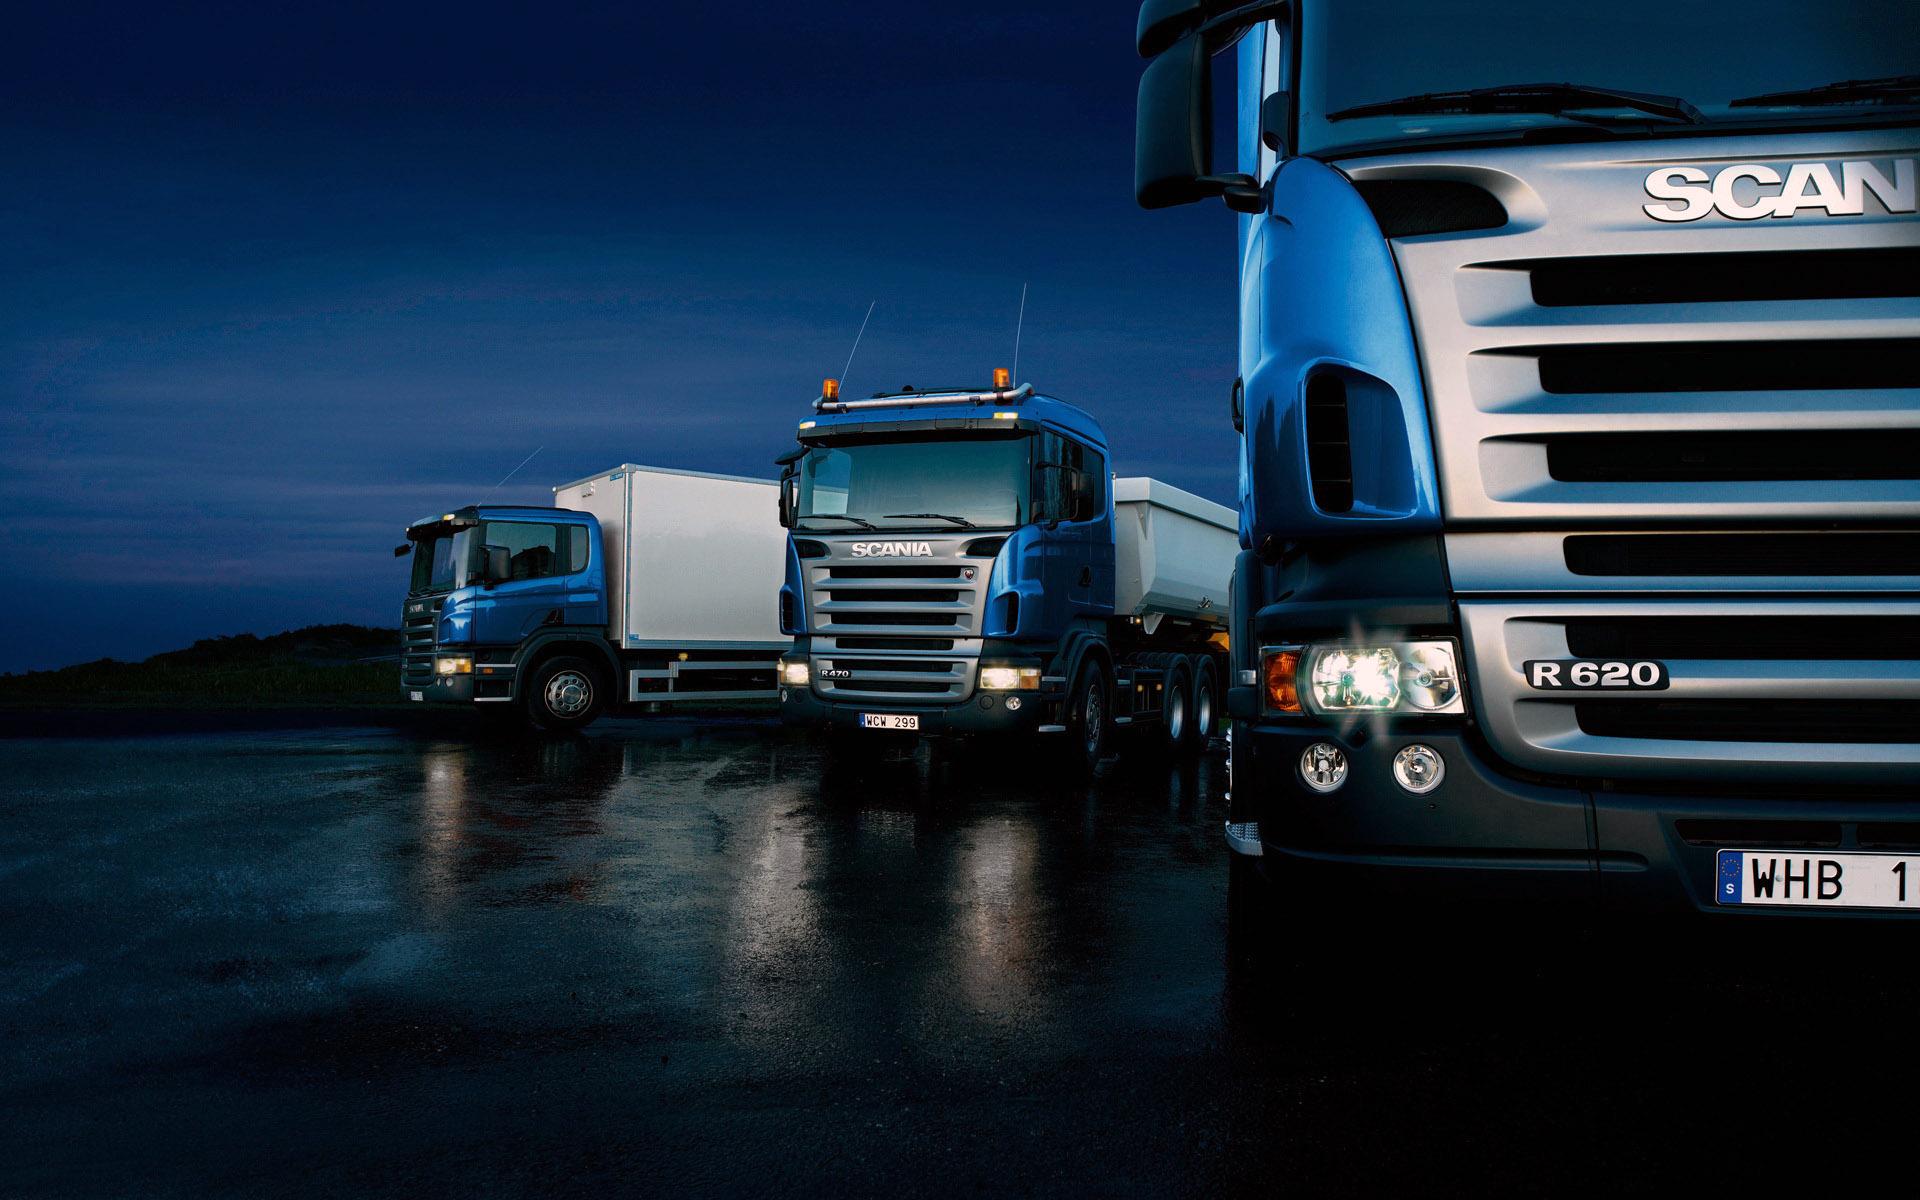 vehicles Heavy duty trucks 1920x1200 Wallpaper 22   Wallcoonet 1920x1200